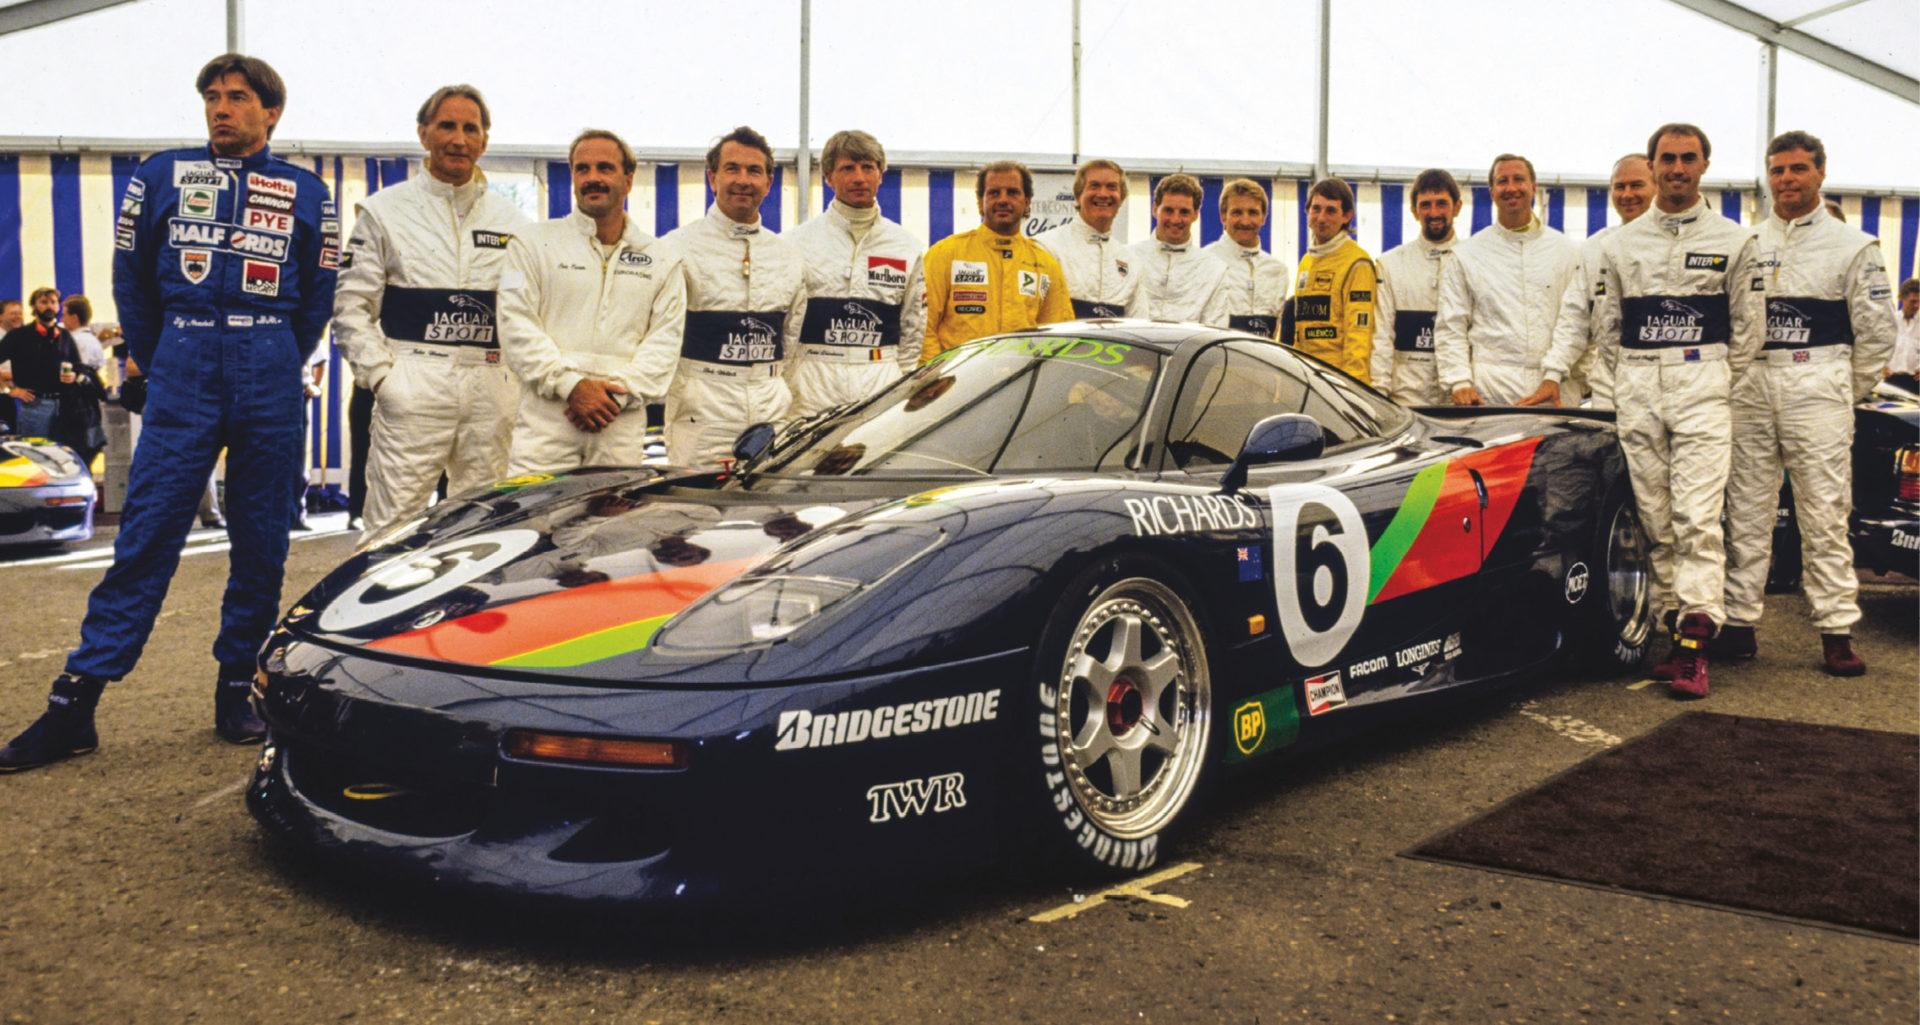 The grid at Spa in 1991. From left: Tiff Needell, John Watson, Cor Euser, Bob Wollek, Pierre Dieudonné, Armin Hahne, Win Percy, Jeff Allam, Will Hoy, Ian Flux, David Leslie, Jim Richards, Thierry Tassin, David Brabham and Derek Warwick